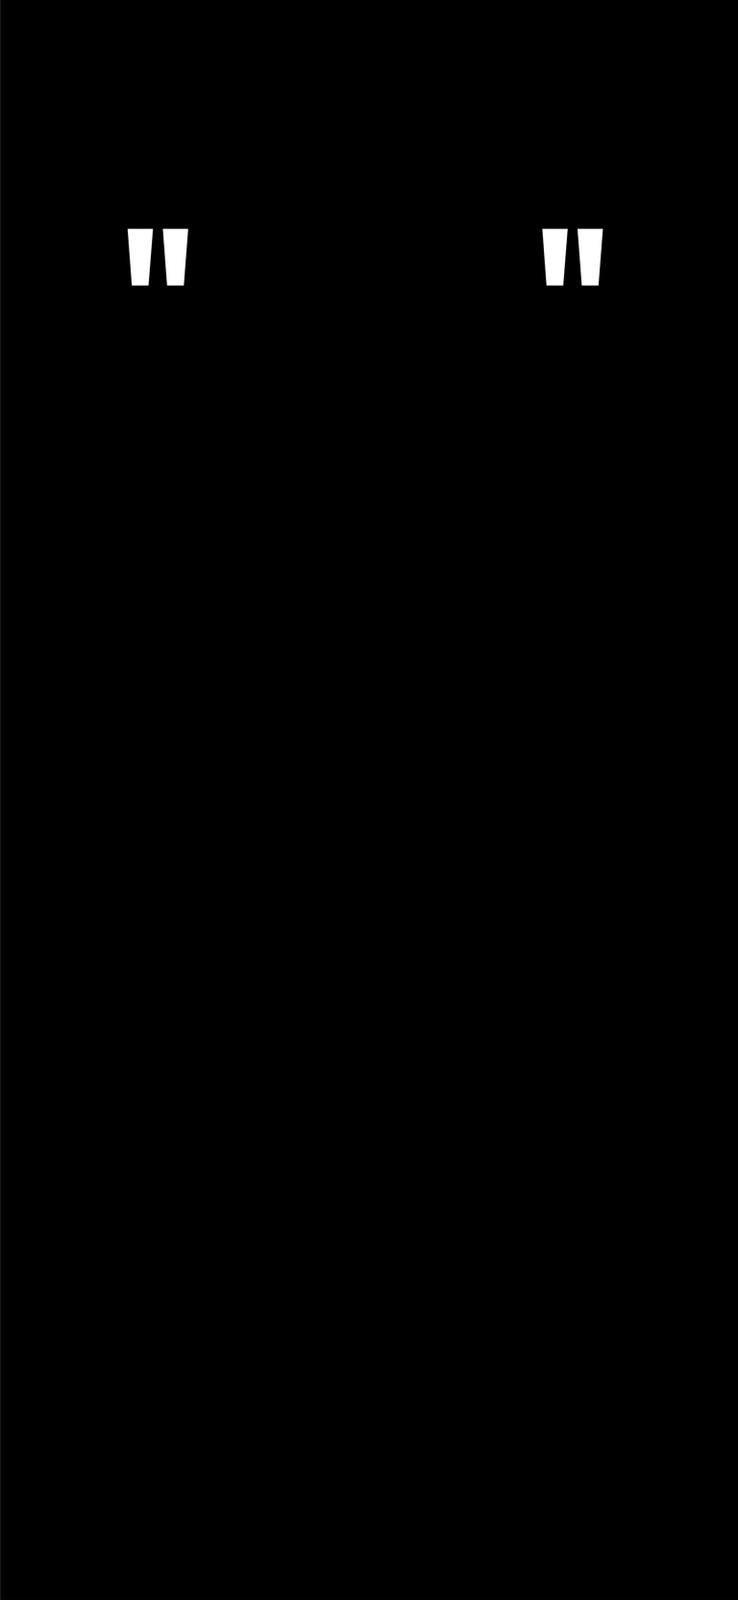 Off White 公式twitterにてスマートフォン用の壁紙が公開 Up To Date